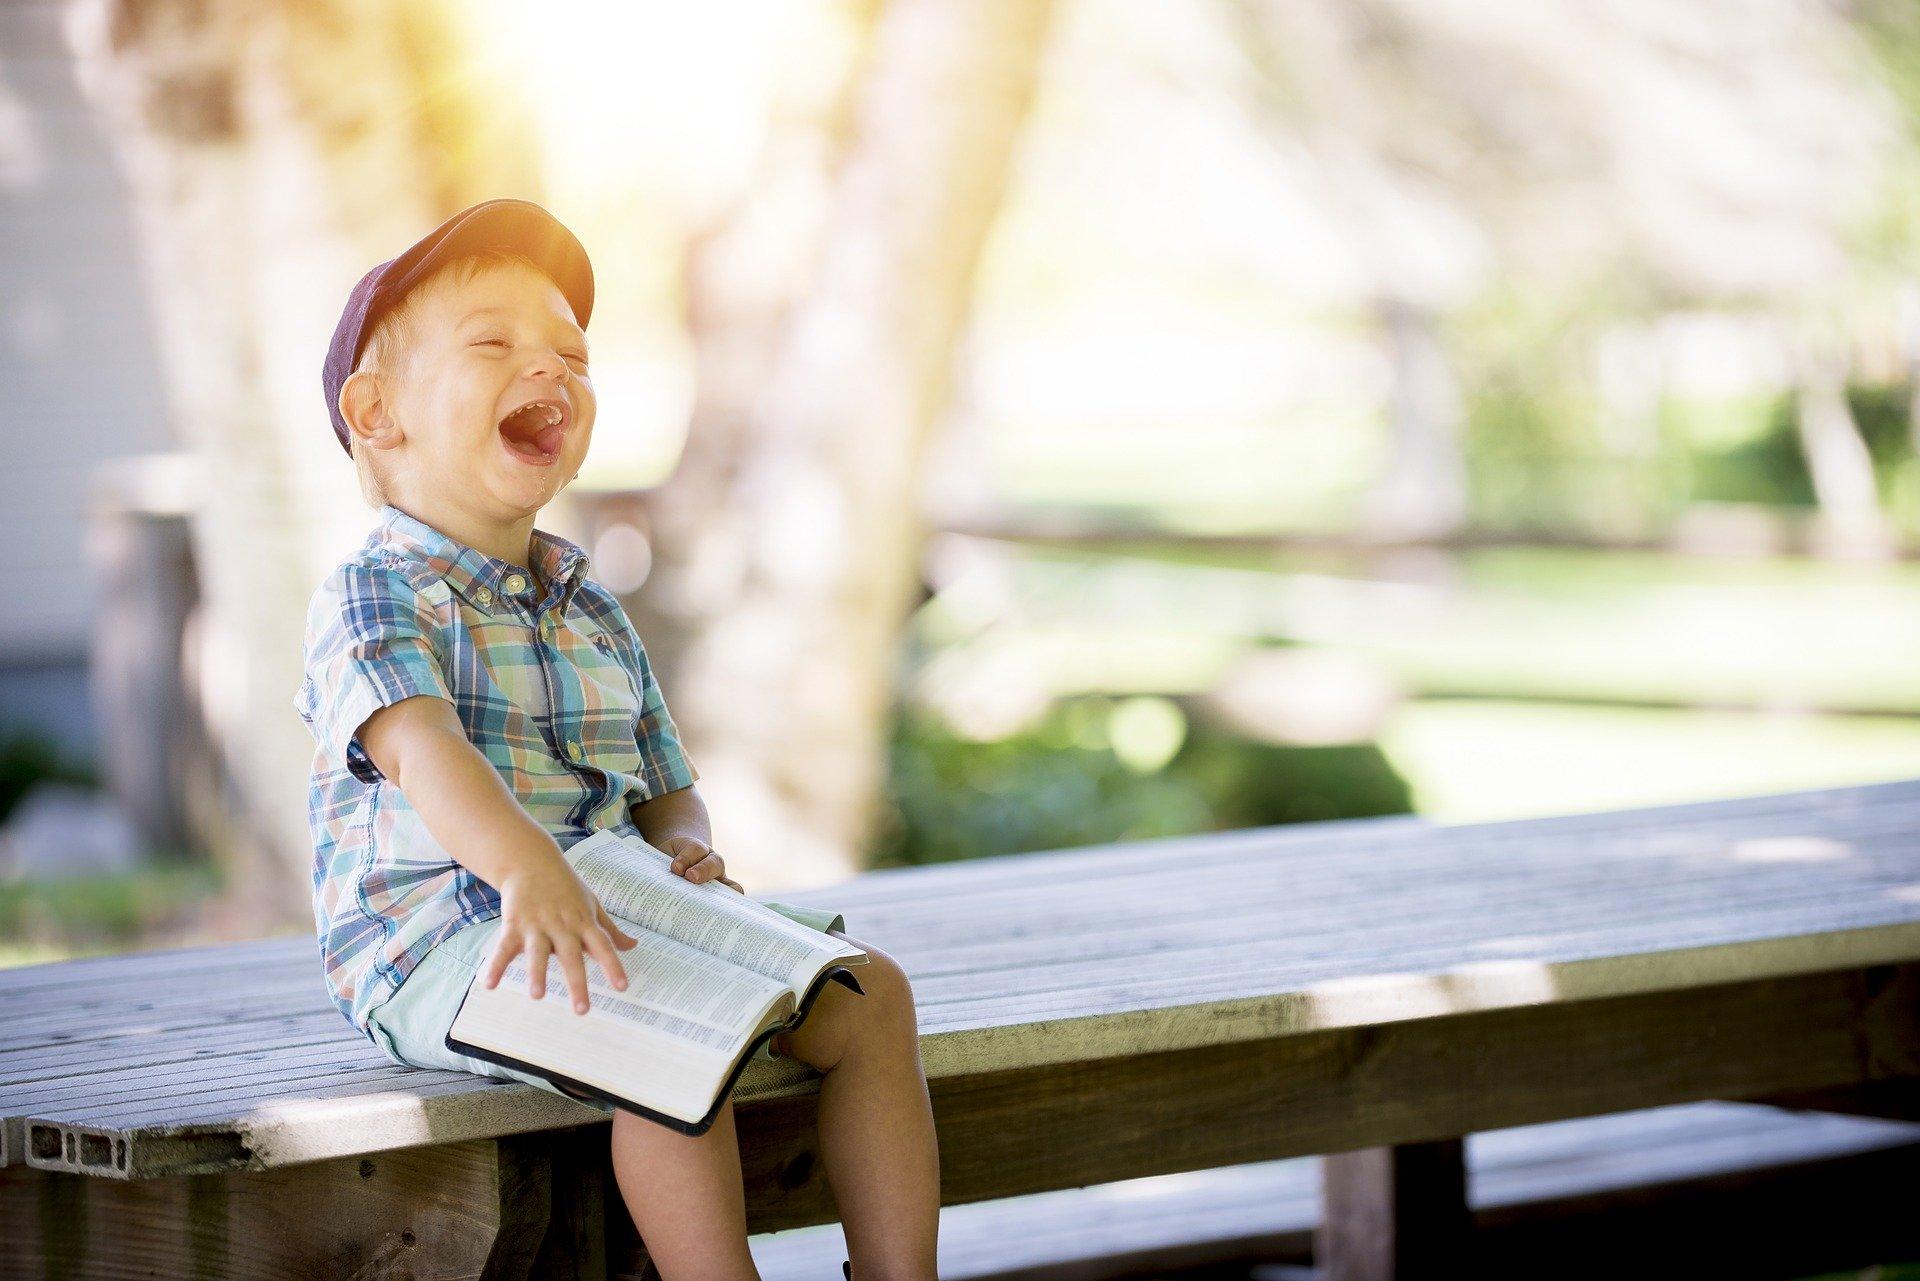 Tønsberg kommune - der barn ler